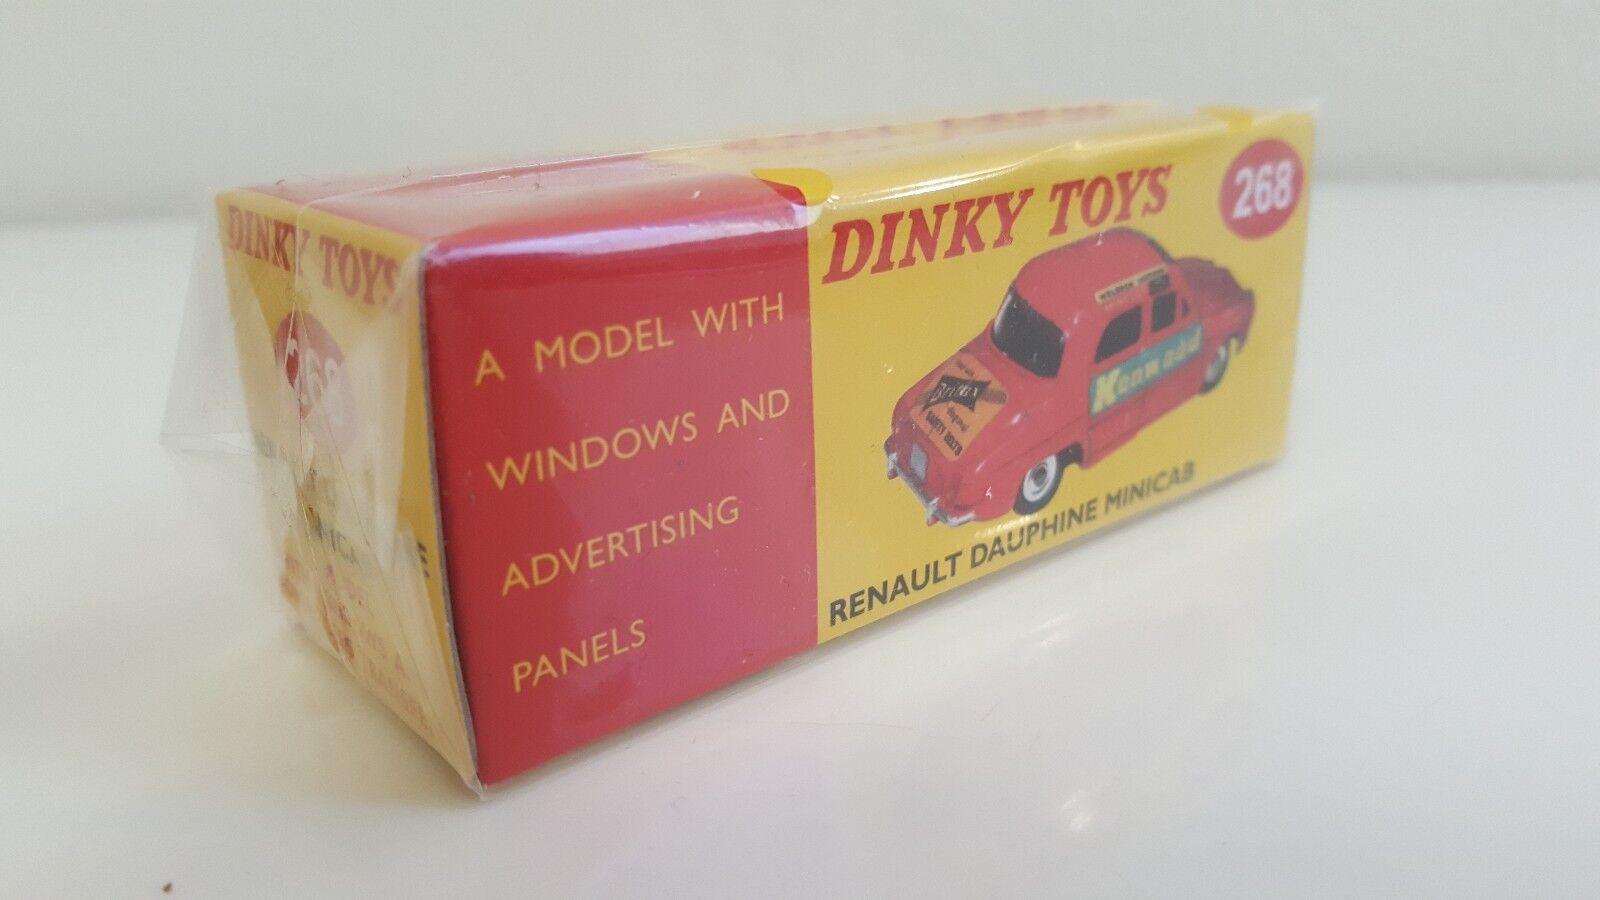 Dinky giocattoli DeAgostini  Renault Dauphine Minicab Taxi Neuve